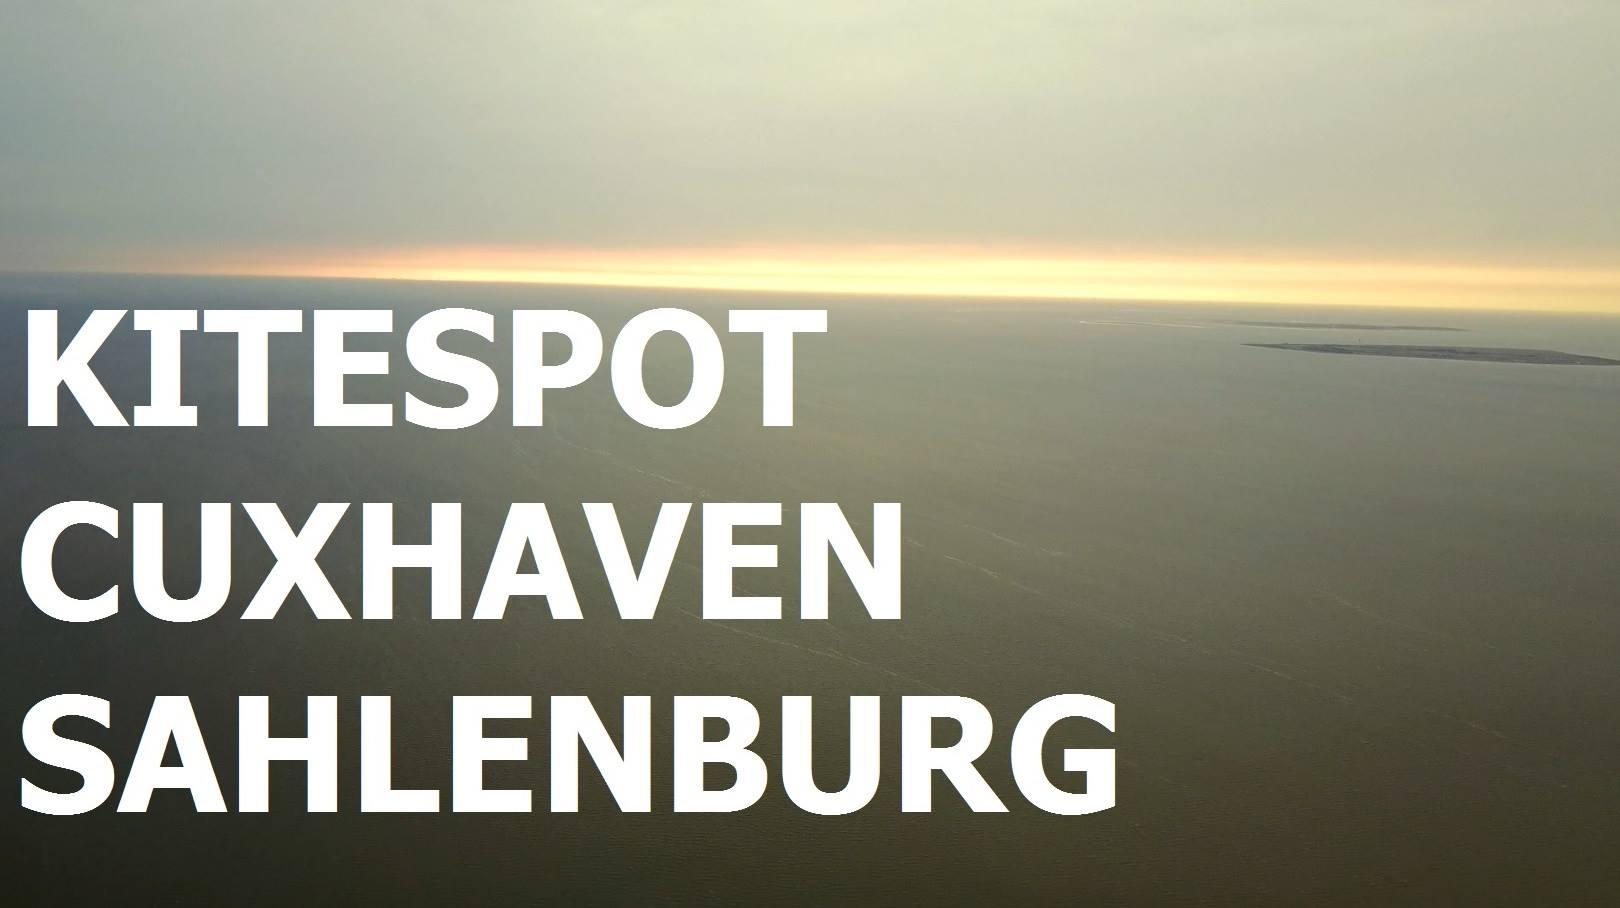 KITESPOT CUXHAVEN SAHLENBURG